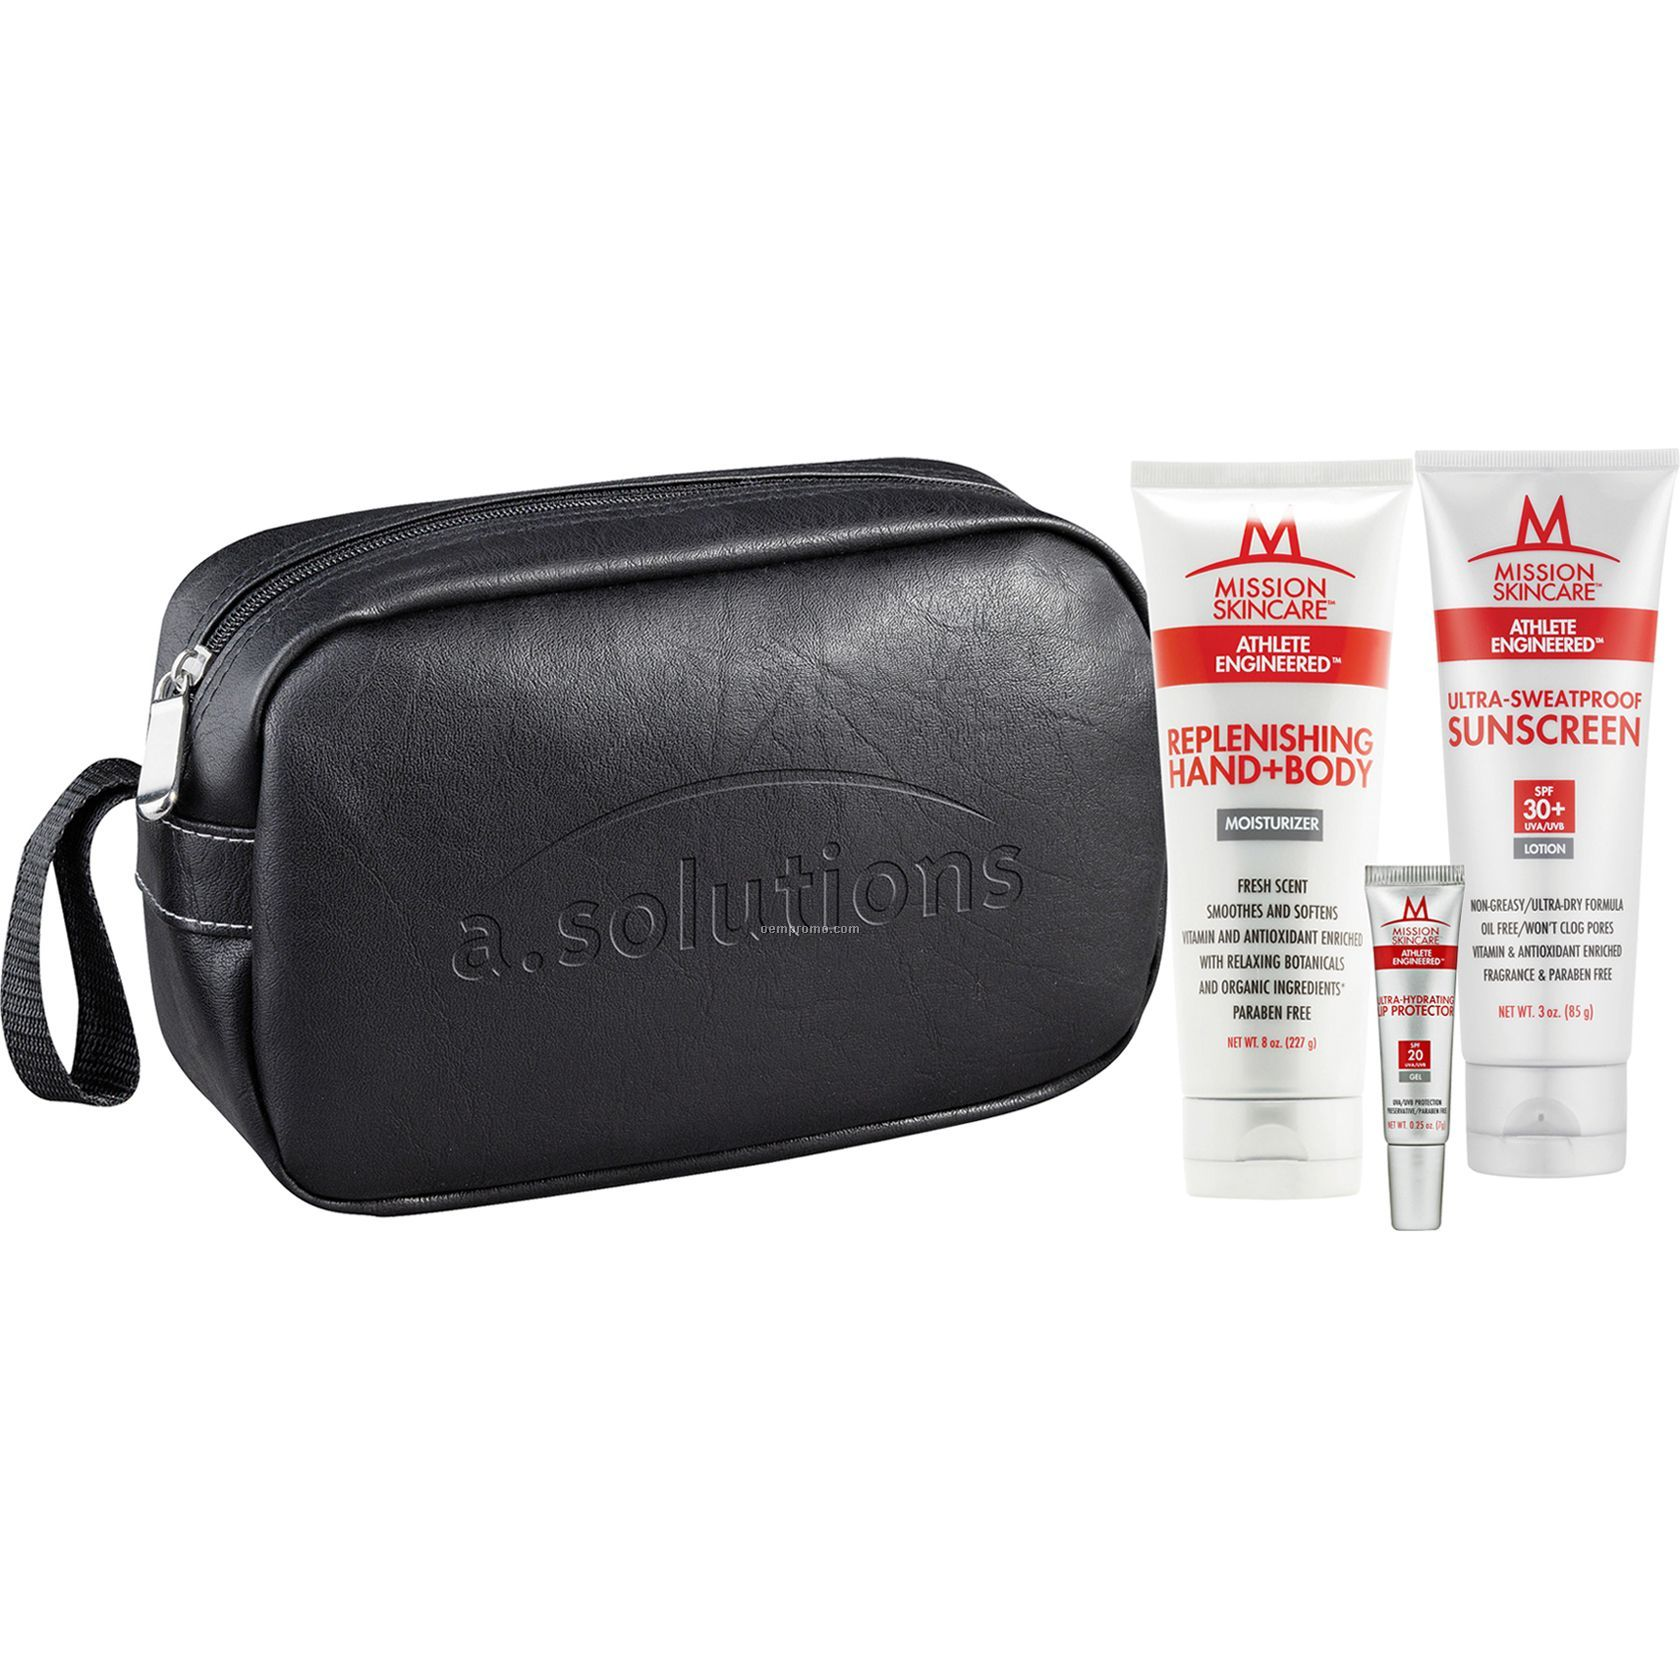 Mission Skincare Full Body Protection Set China Wholesale